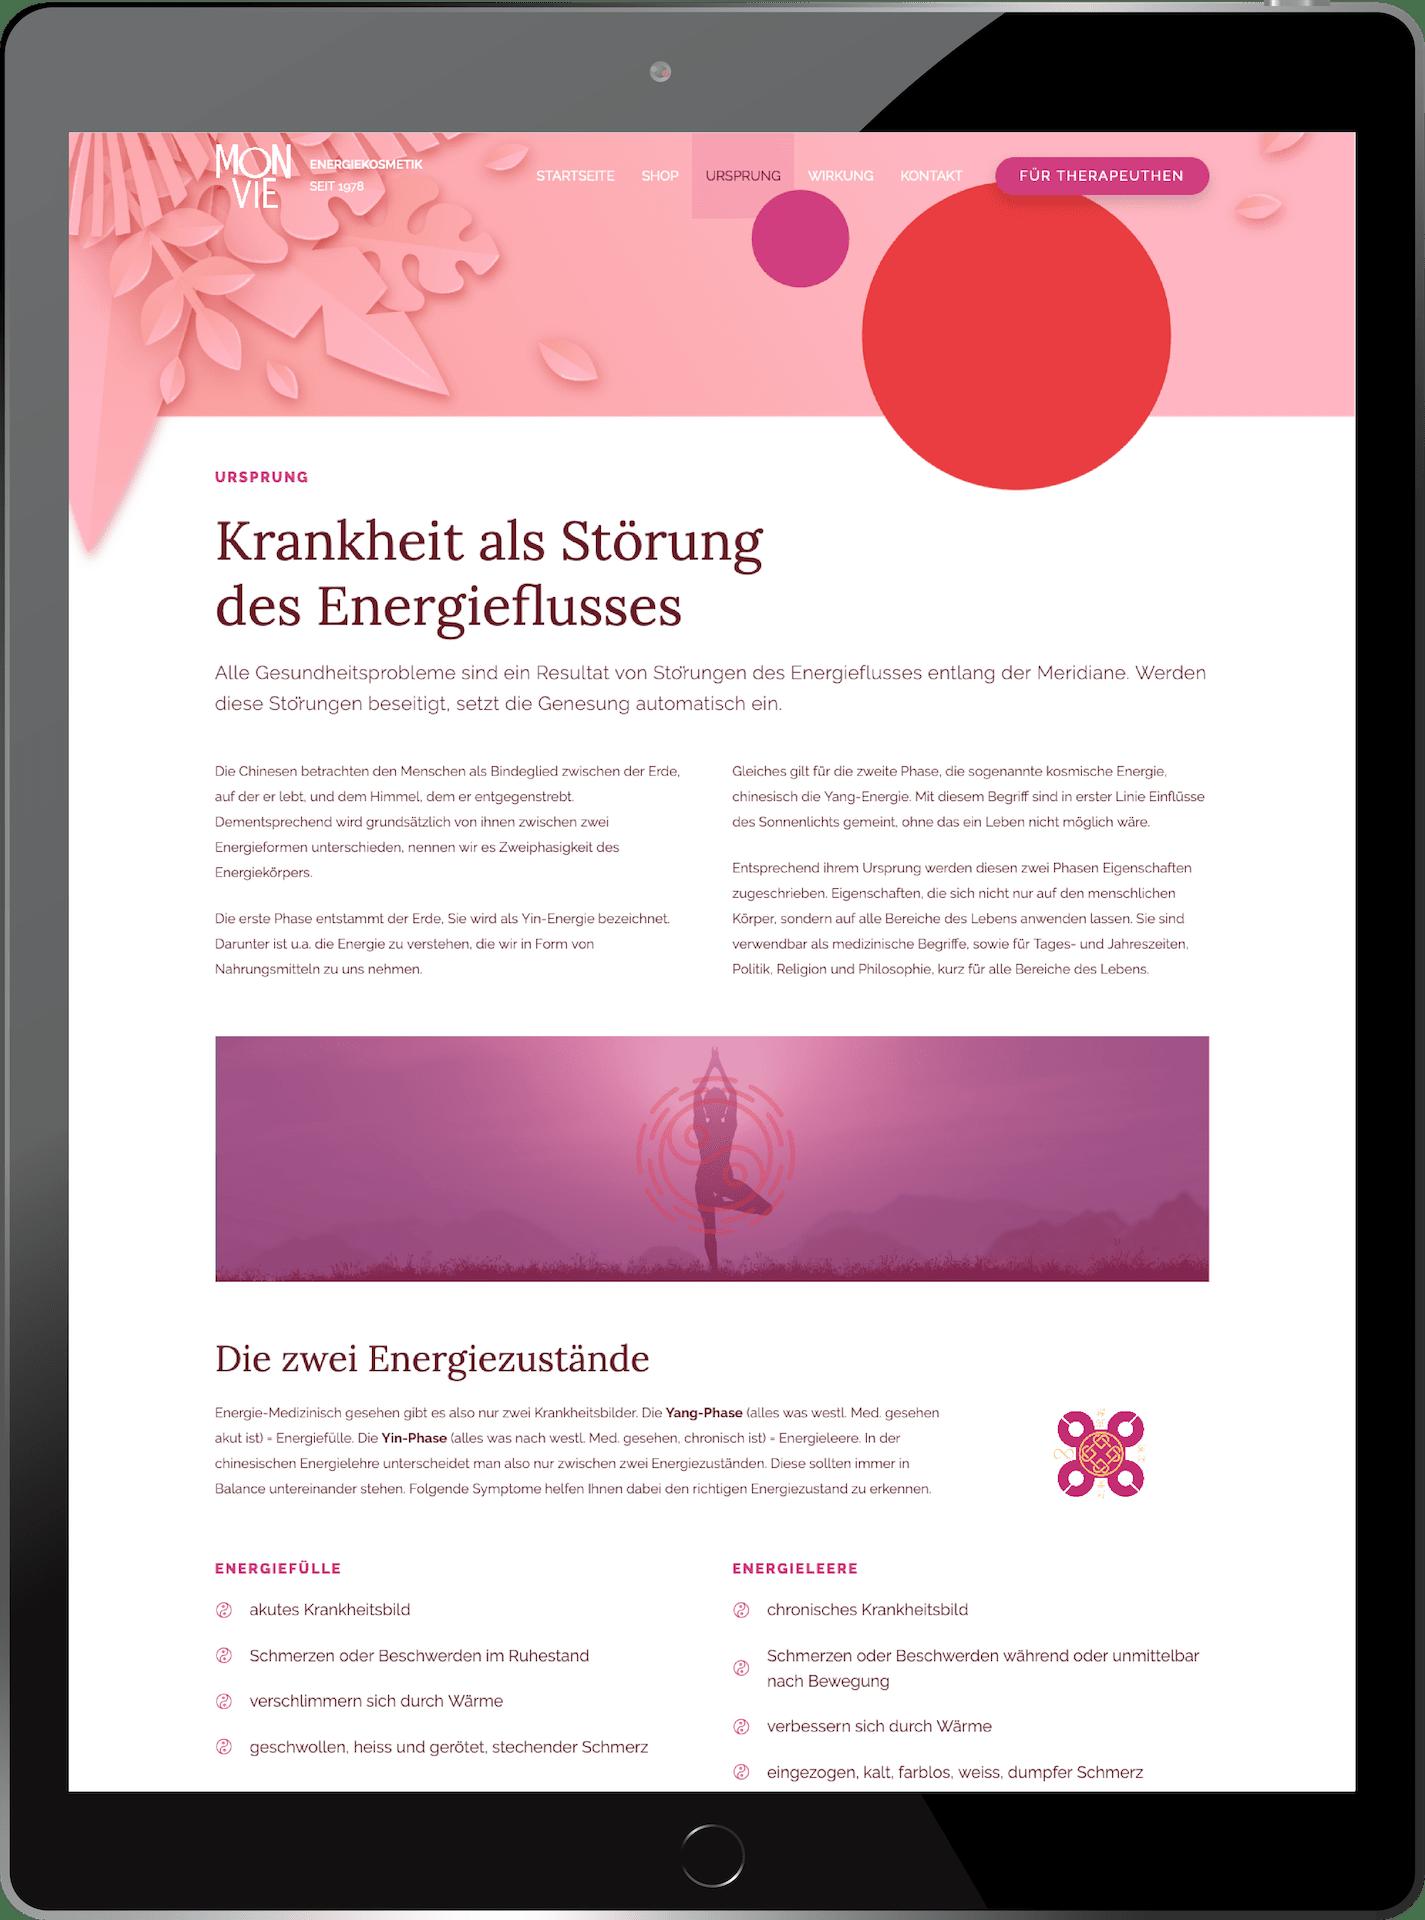 minuteman's Portfolio - Monvie EnerQi Energiekosmetik - Bodylotion und Massagecreme - Mockup am Tablet - Ursprung der Creme